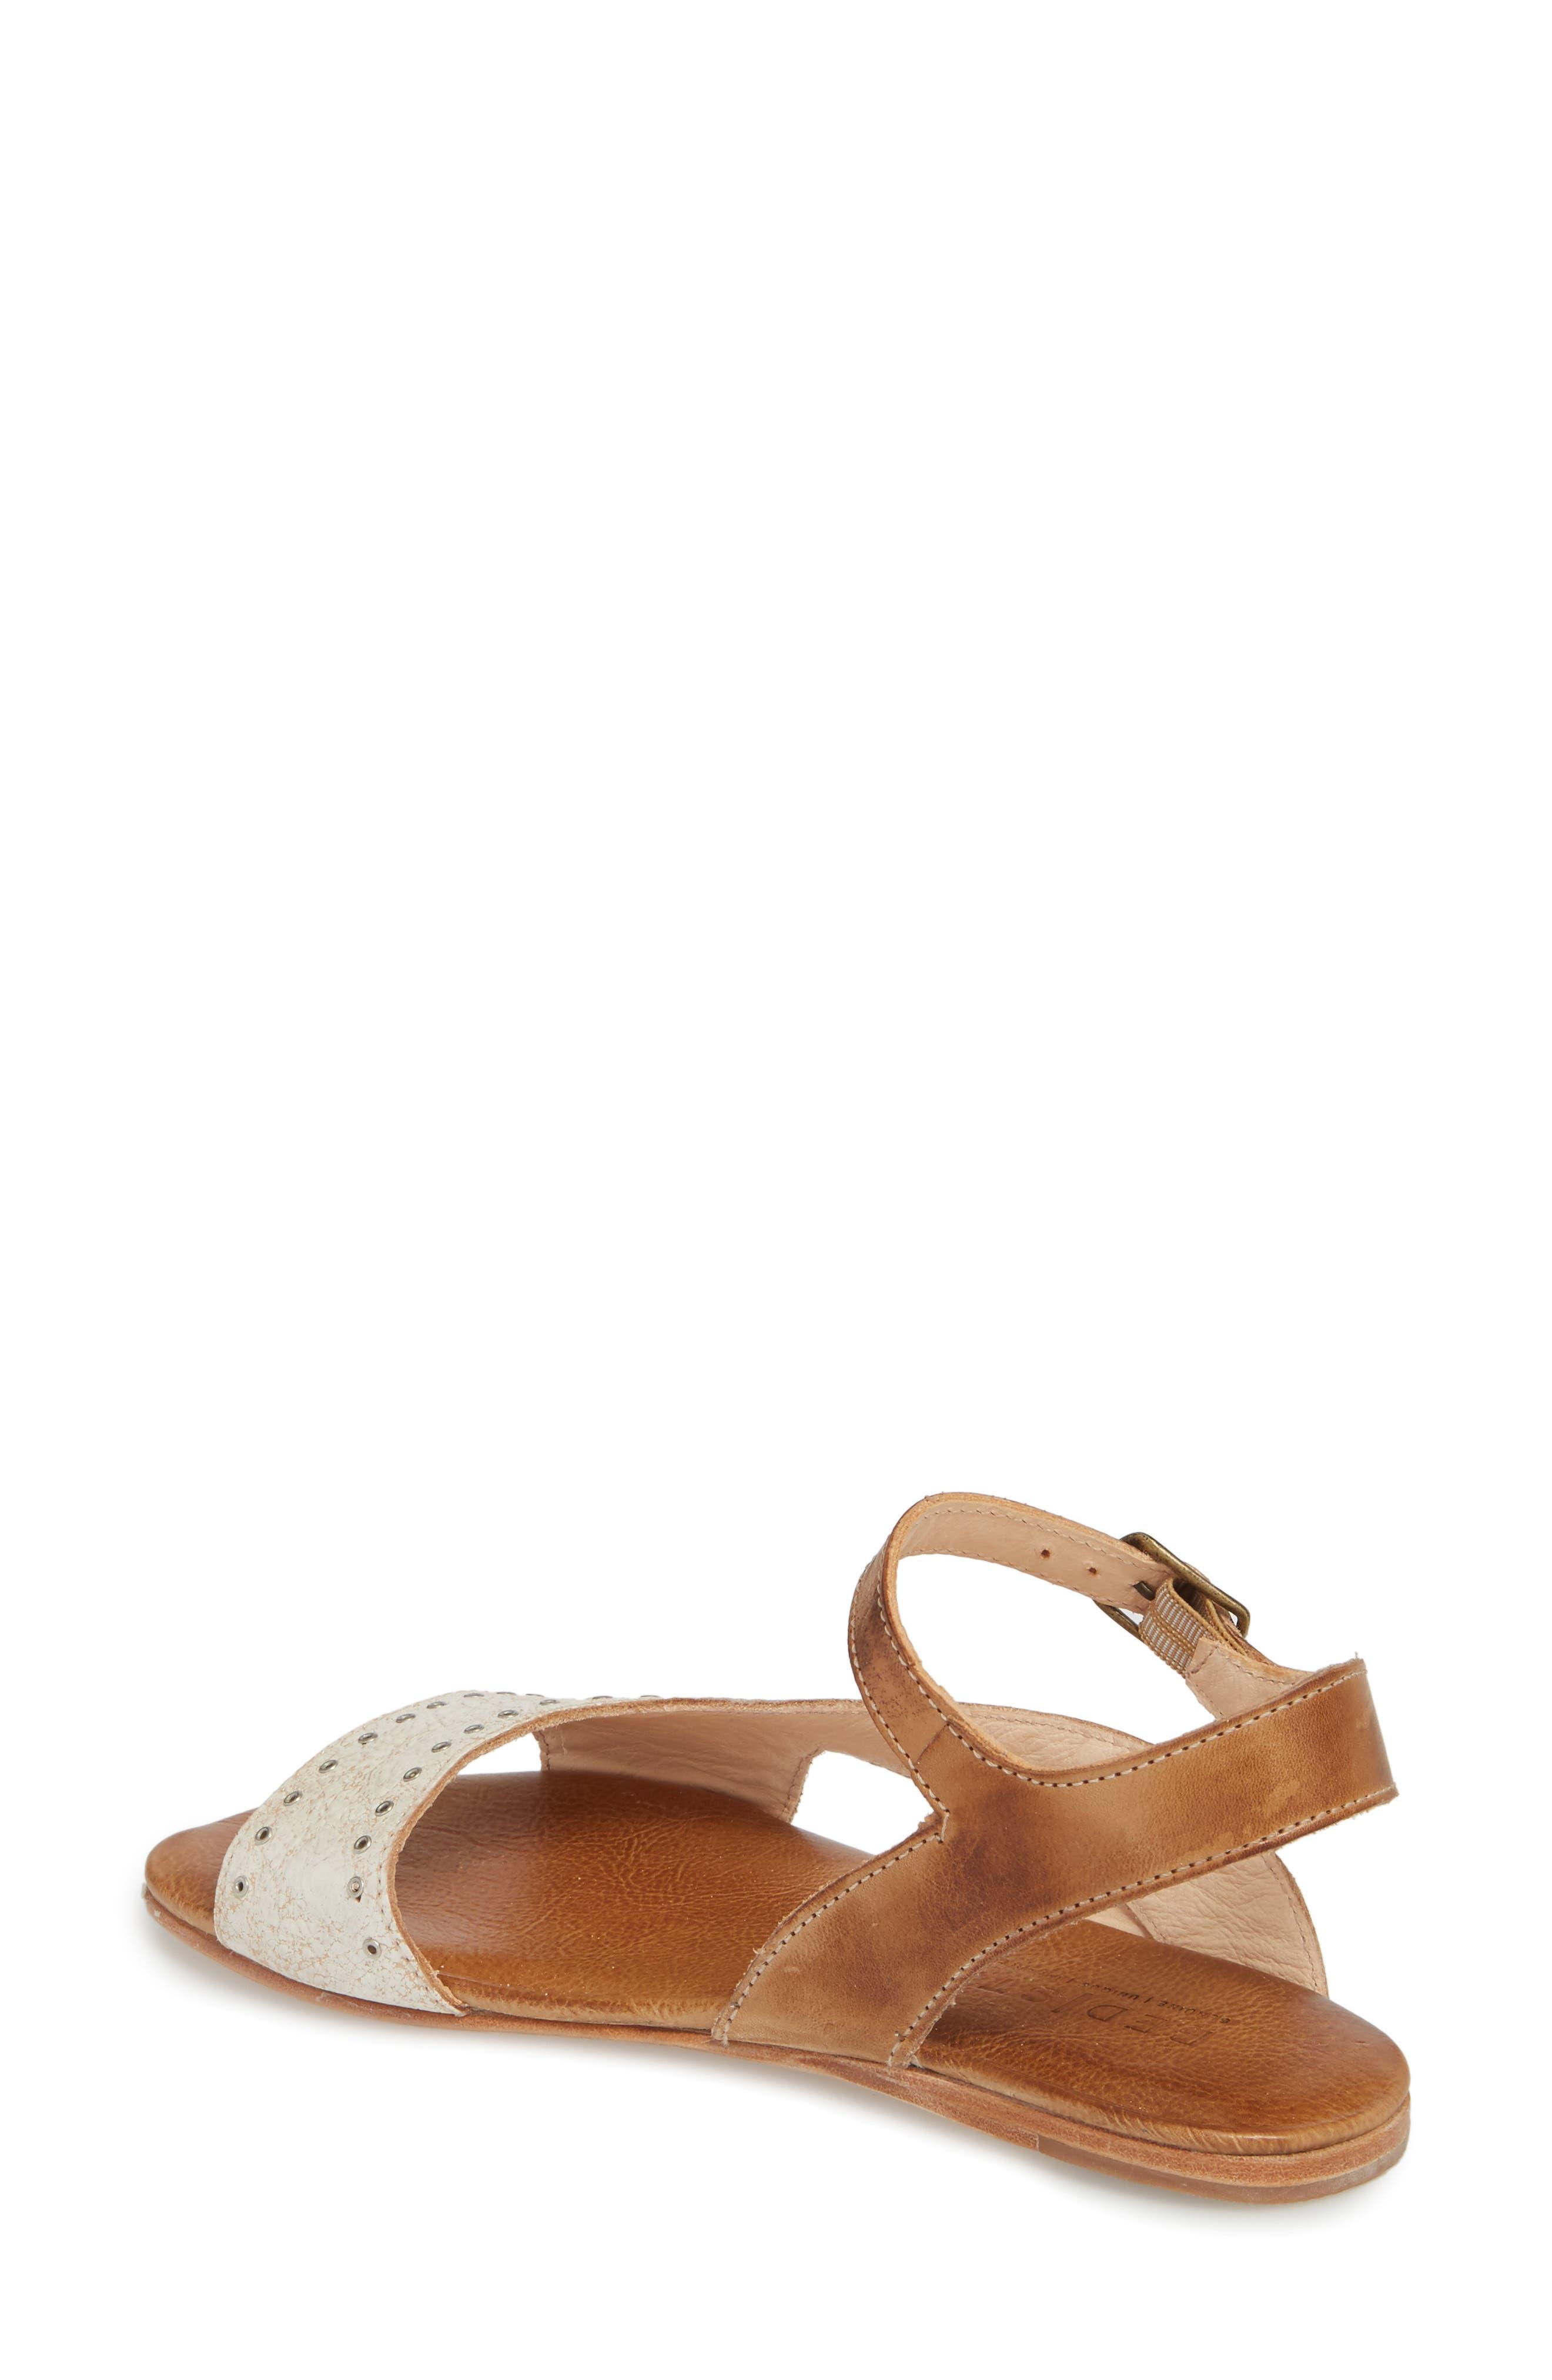 Auburn Flat Sandal,                             Alternate thumbnail 2, color,                             Nectar/ Tan Leather